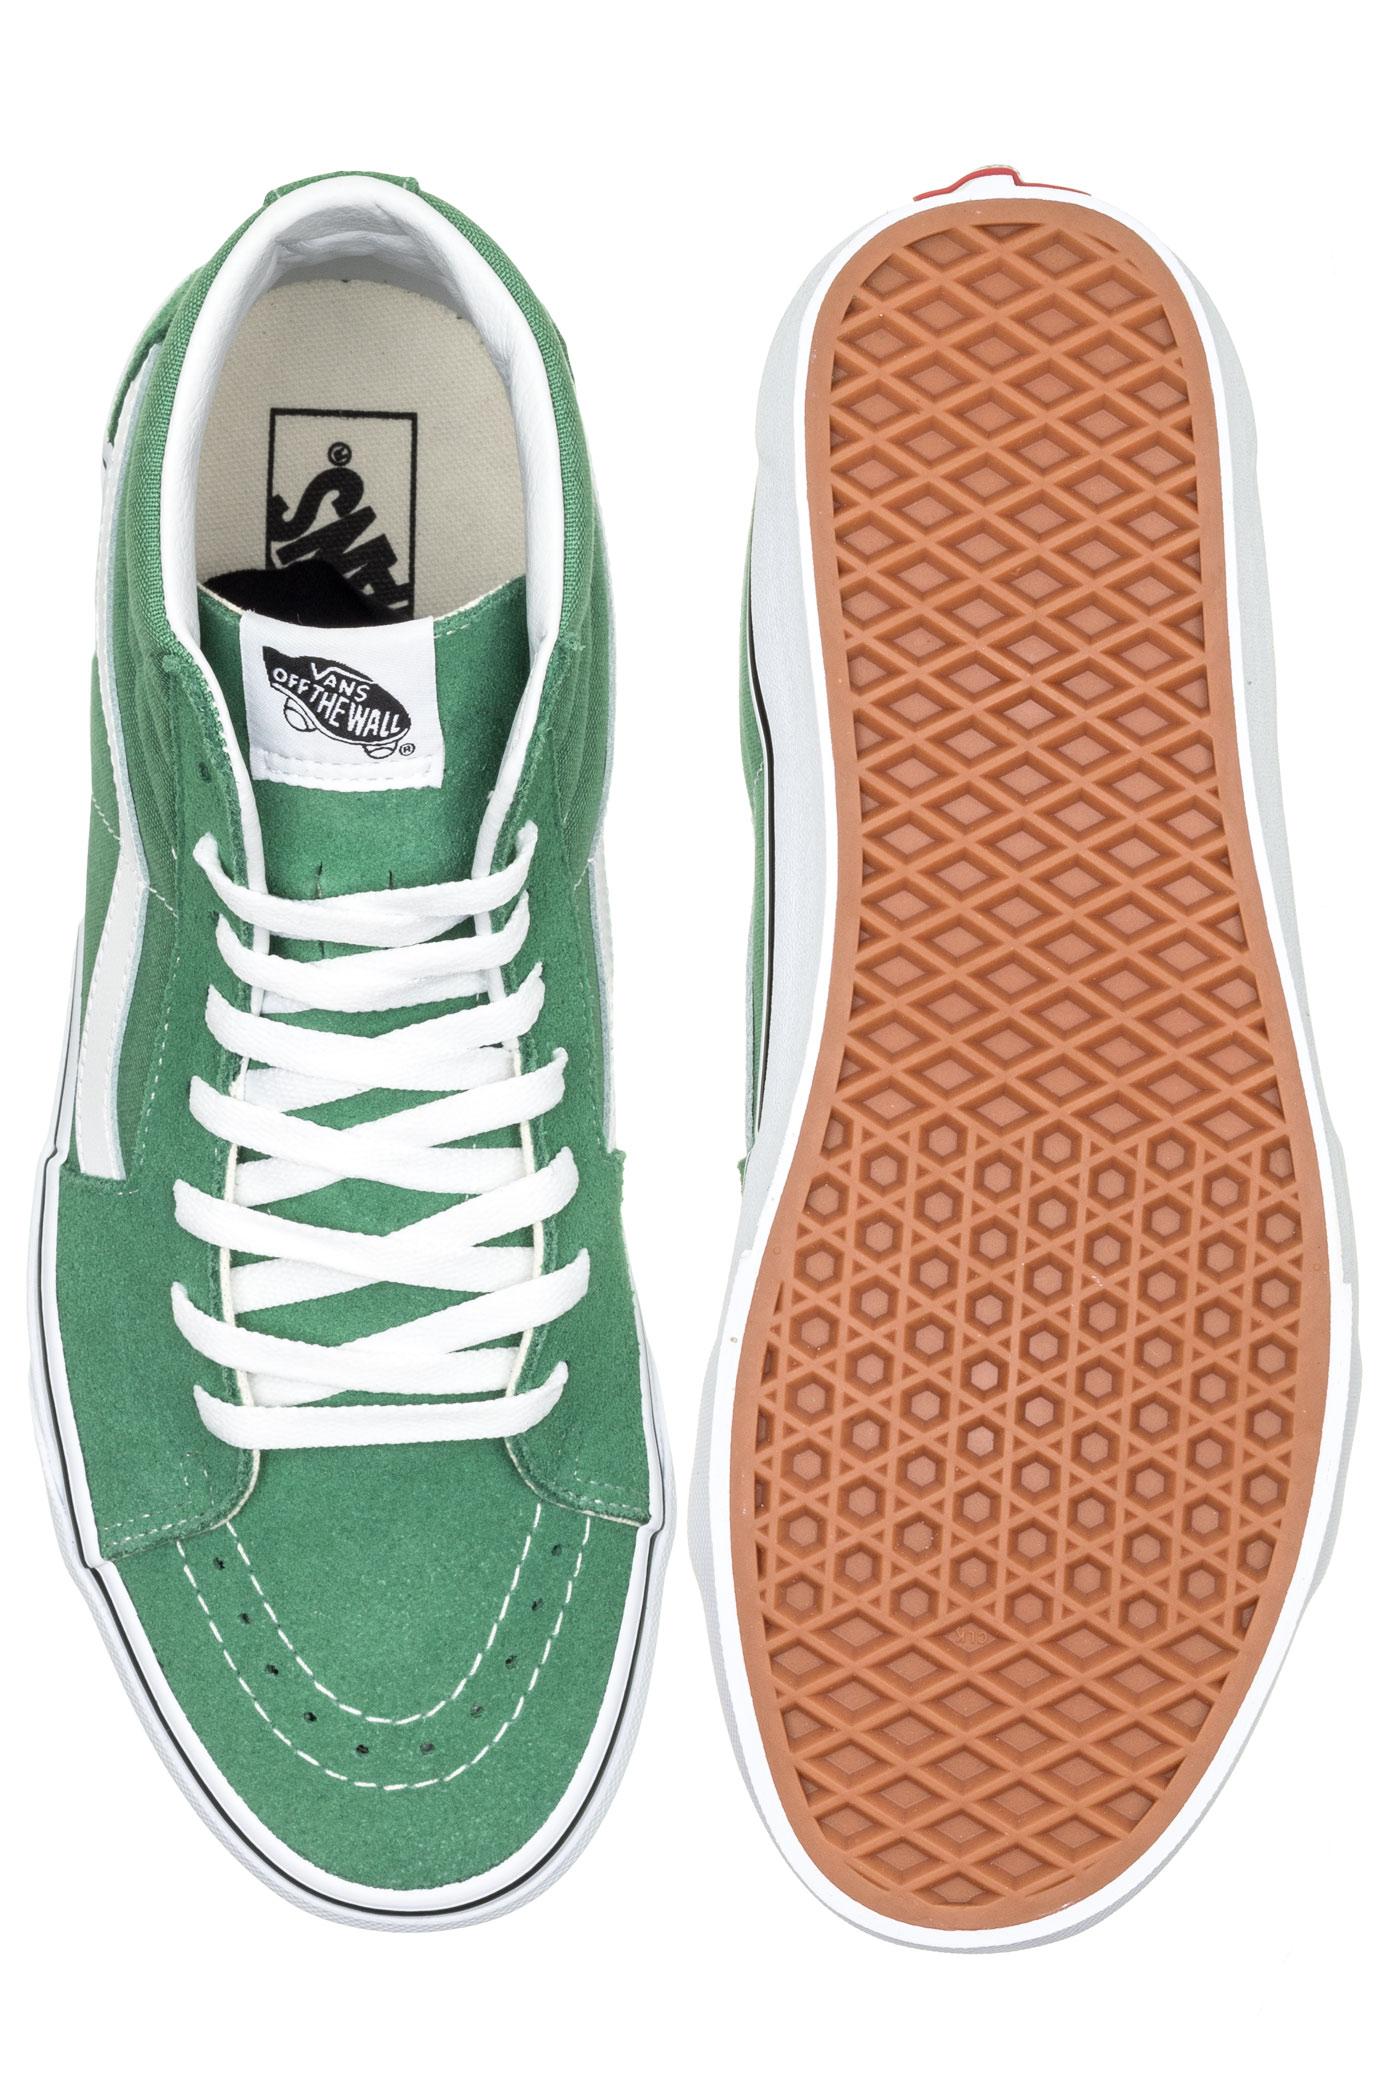 Green Grass Vans Sk8 hi Chaussuredeep 8nmN0w